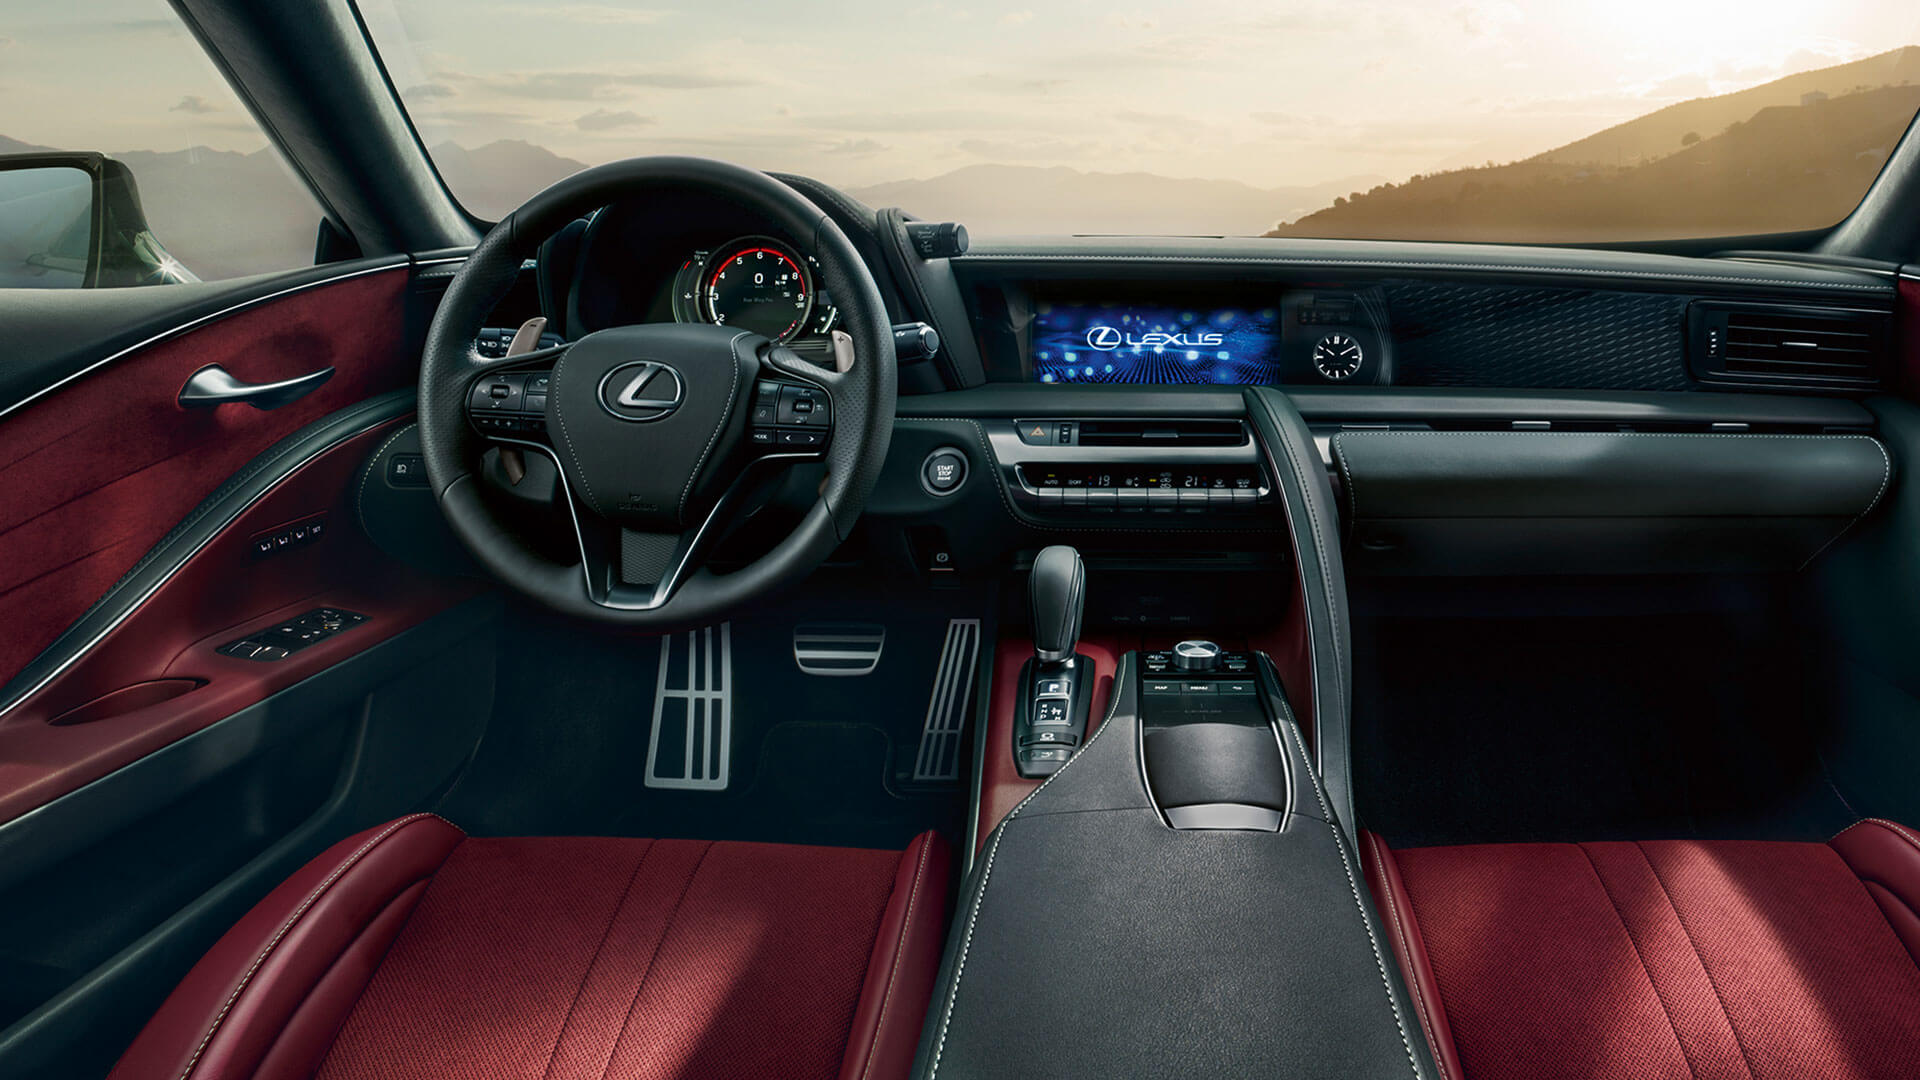 Lexus LC review image 2.jpg (232 KB)